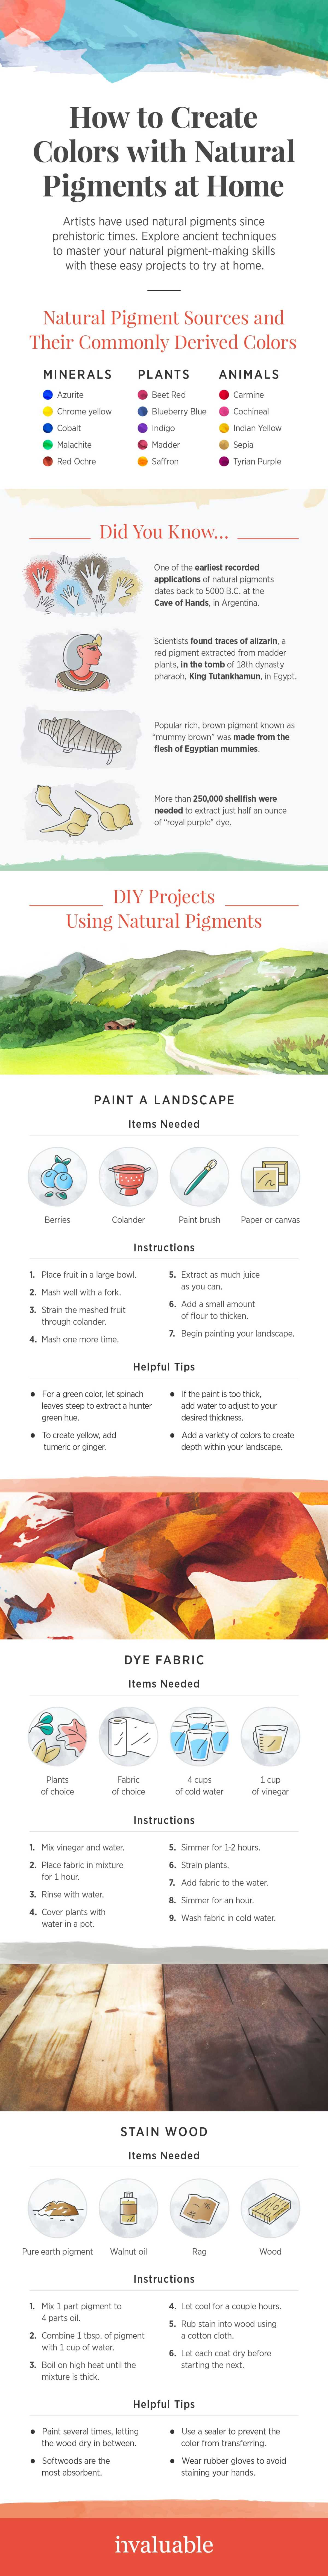 DIY Natural Pigments [Infographic] | ecogreenlove